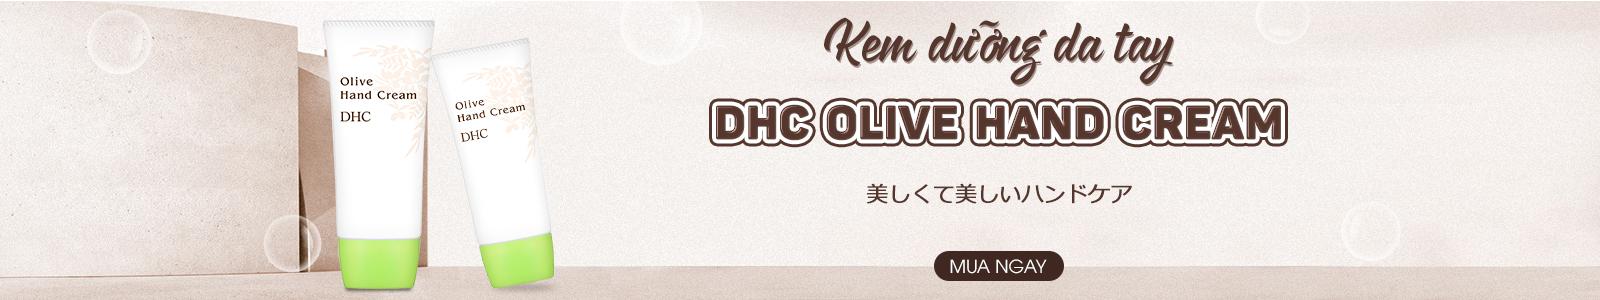 Kem dưỡng da tay DHC Olive Hand Cream 55g